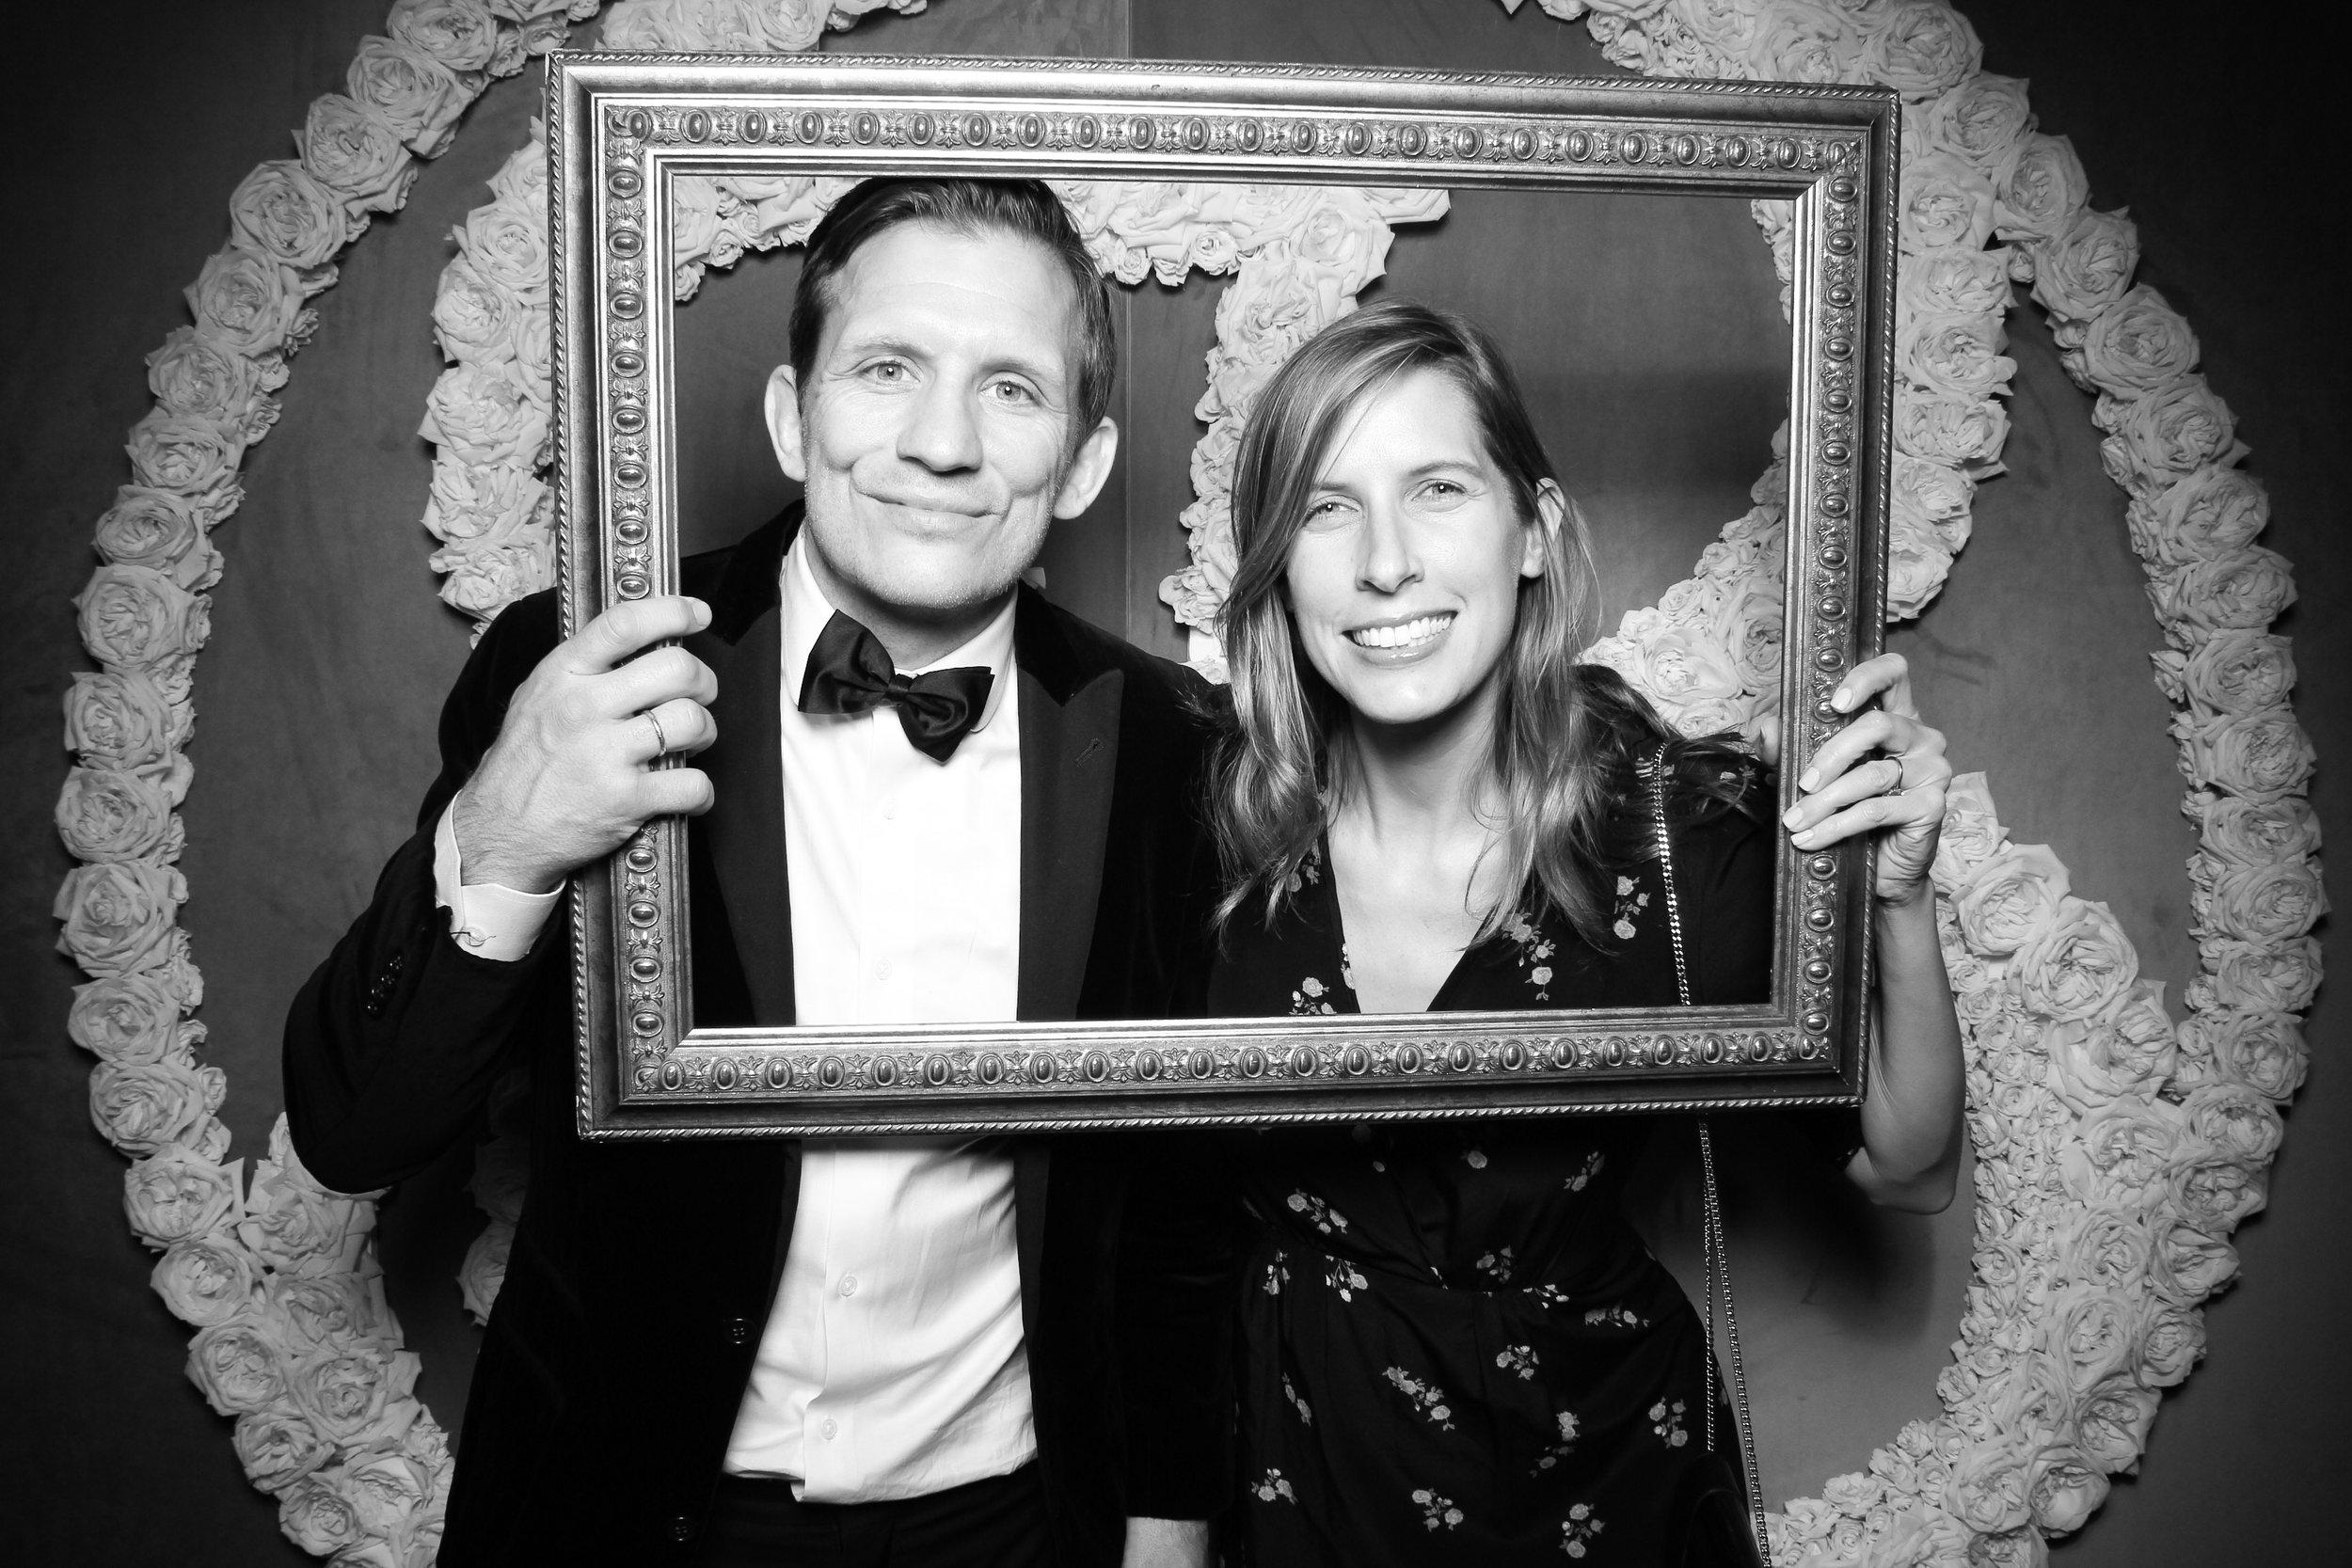 Photo_Booth_Rental_At_Standard_Club_Wedding_Chicago_20.jpg